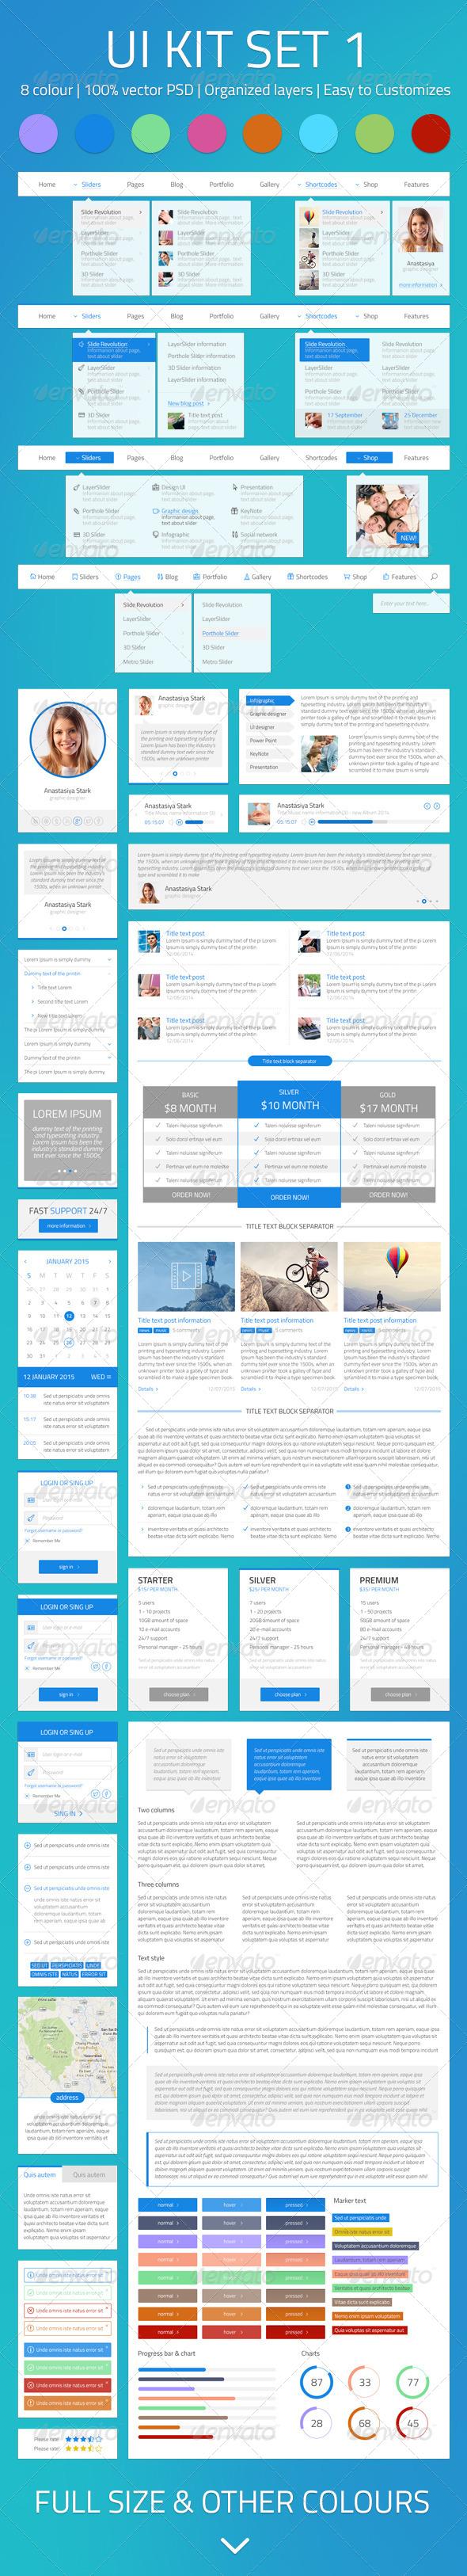 GraphicRiver UI Kit set 1 7858462